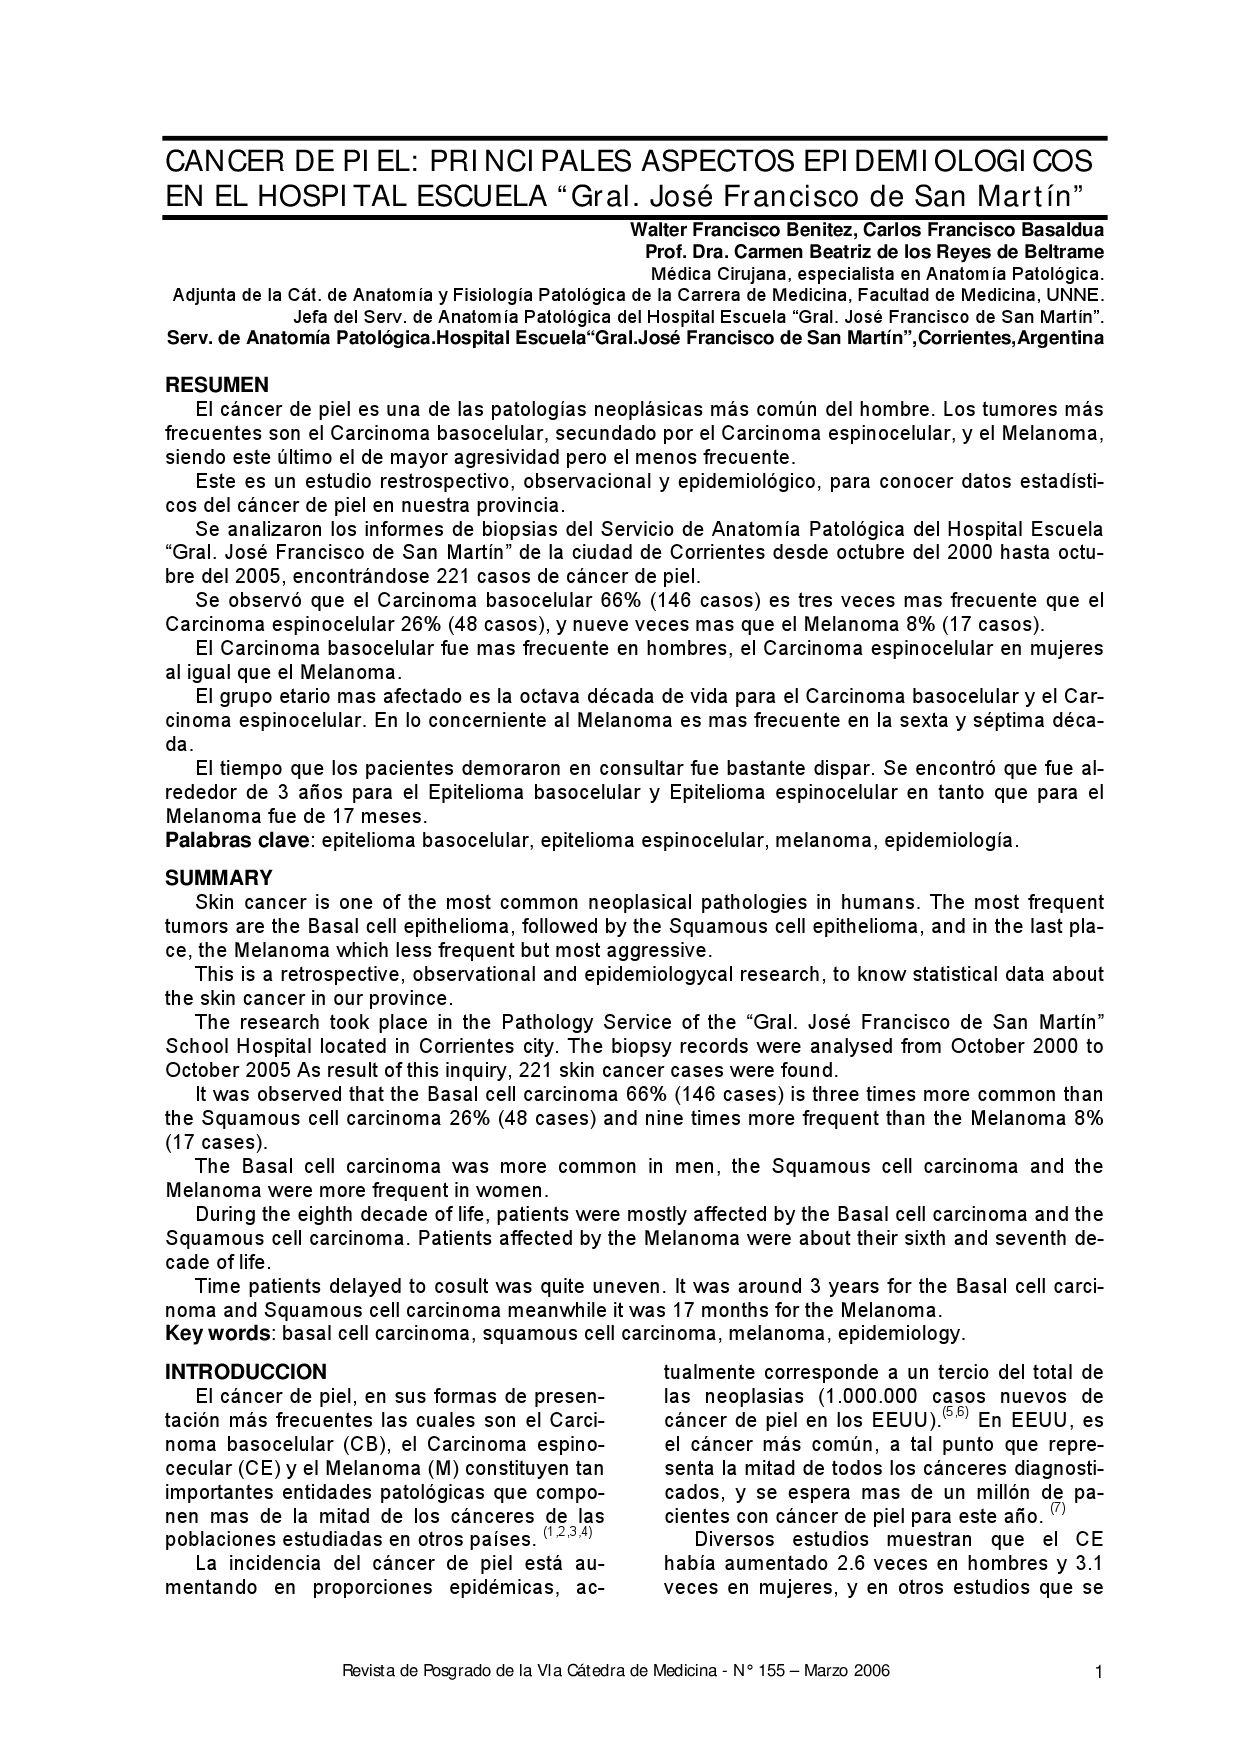 CANCER DE PIEL: PRINCIPALES ASPECTOS EPIDEMIOLOGICOS by Caroll ...